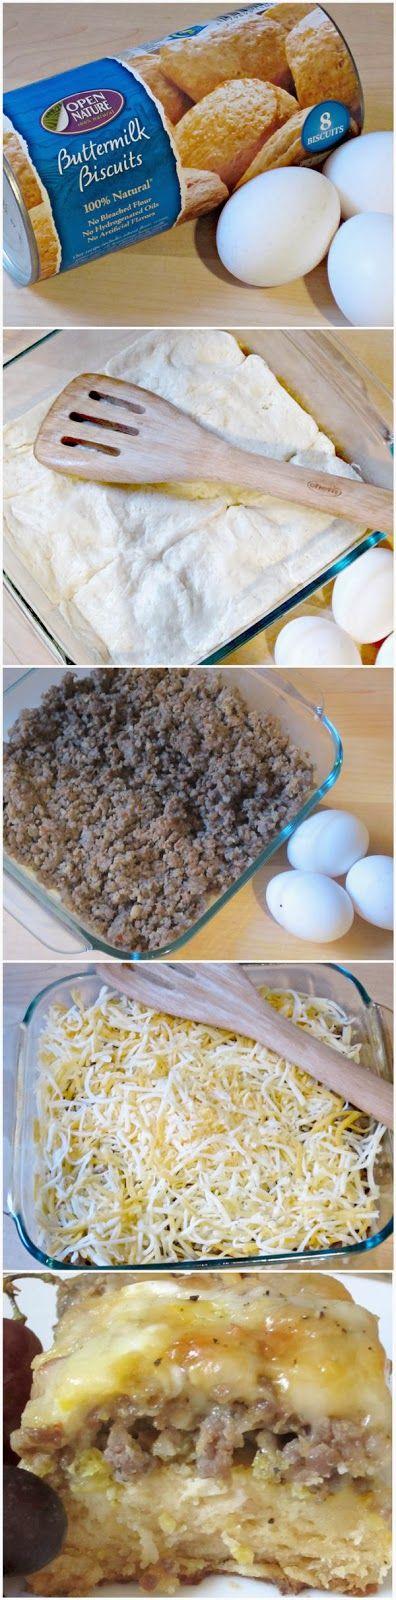 Recipe Favorite: Weekend Biscuit Egg Casserole